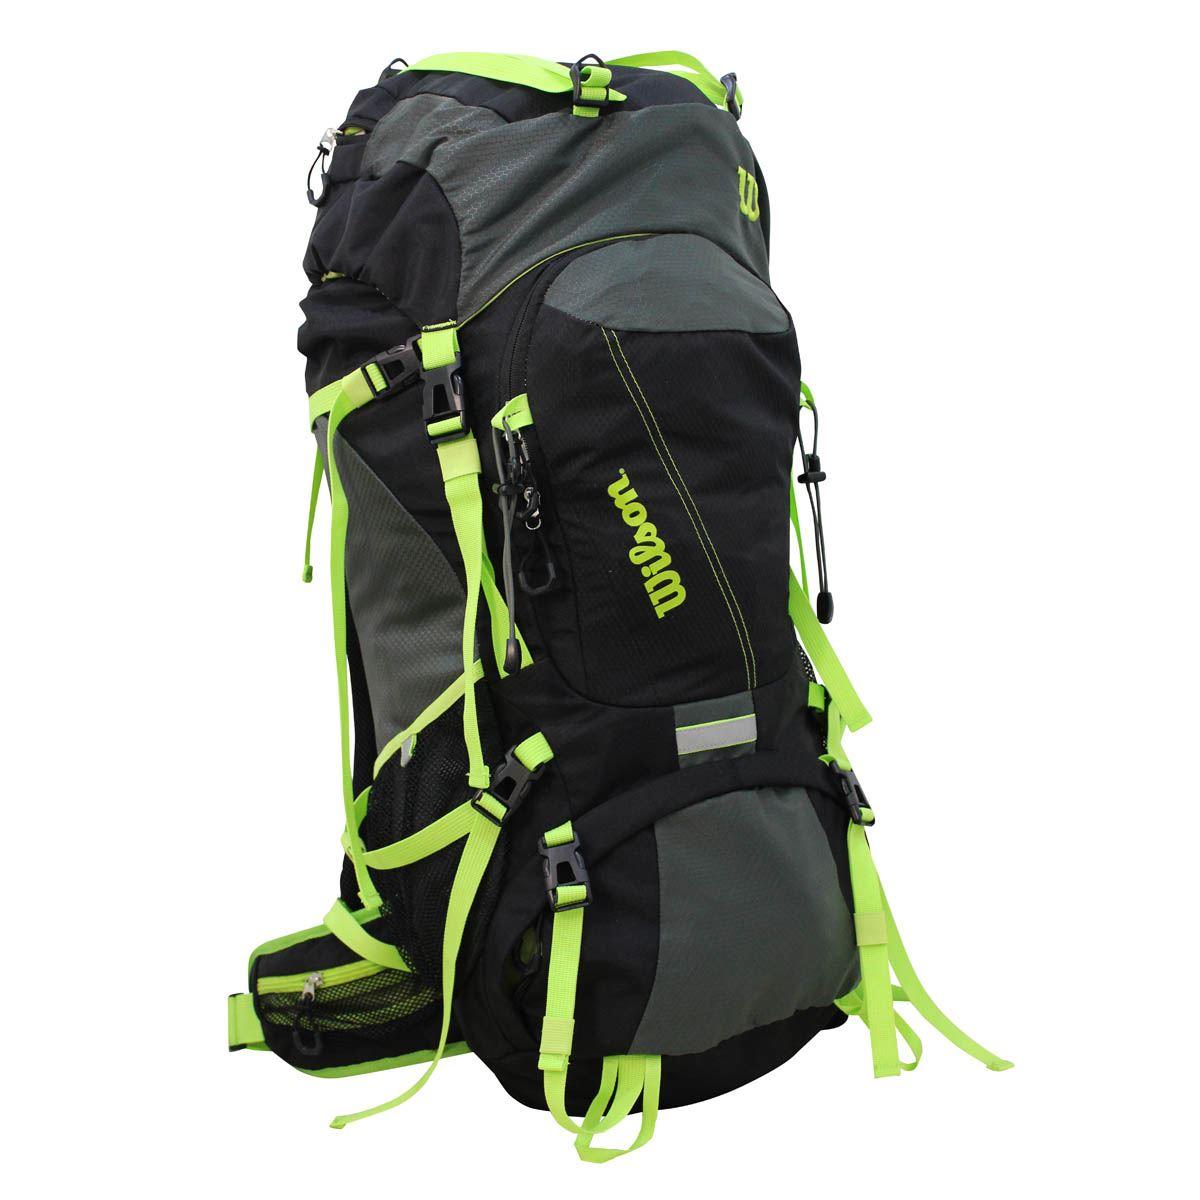 Camping Bag Ie-15104 Black/Green Wilson